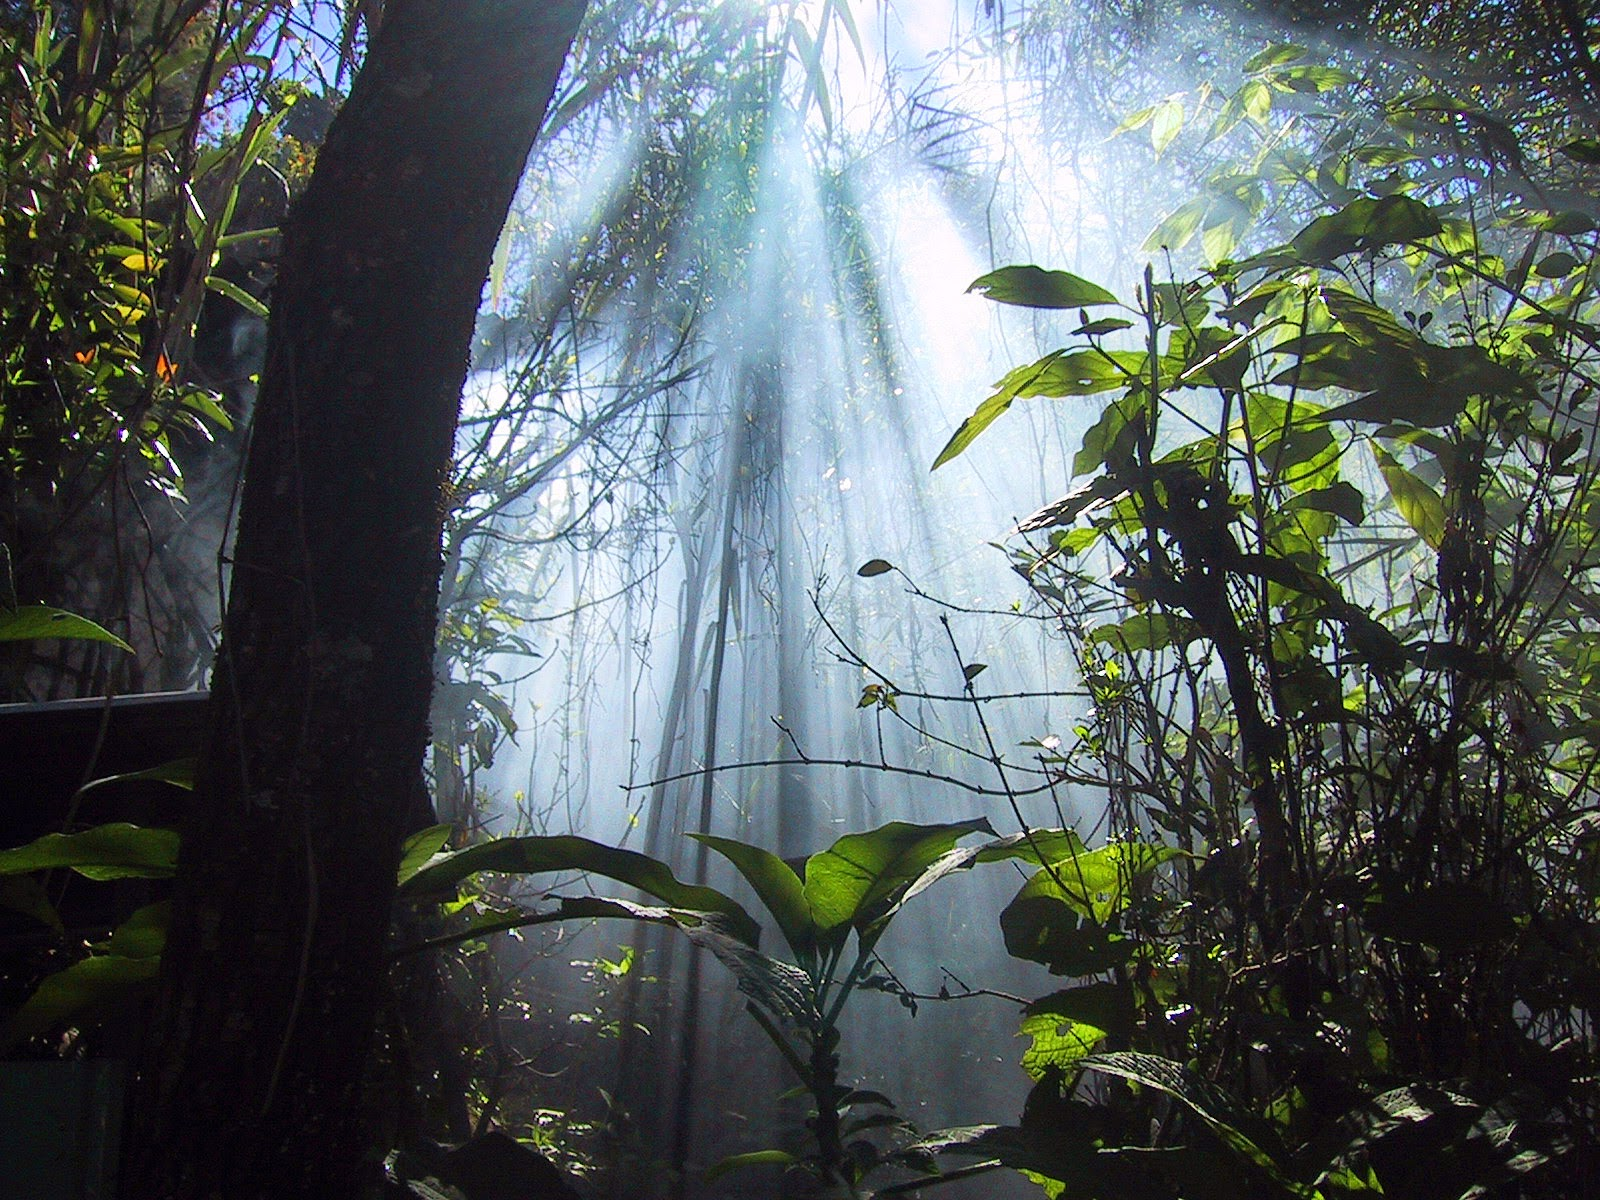 Sinharaja Forest Sabaragamuwa, Sri Lanka 10 Worlds Amazing And Beautiful Forests